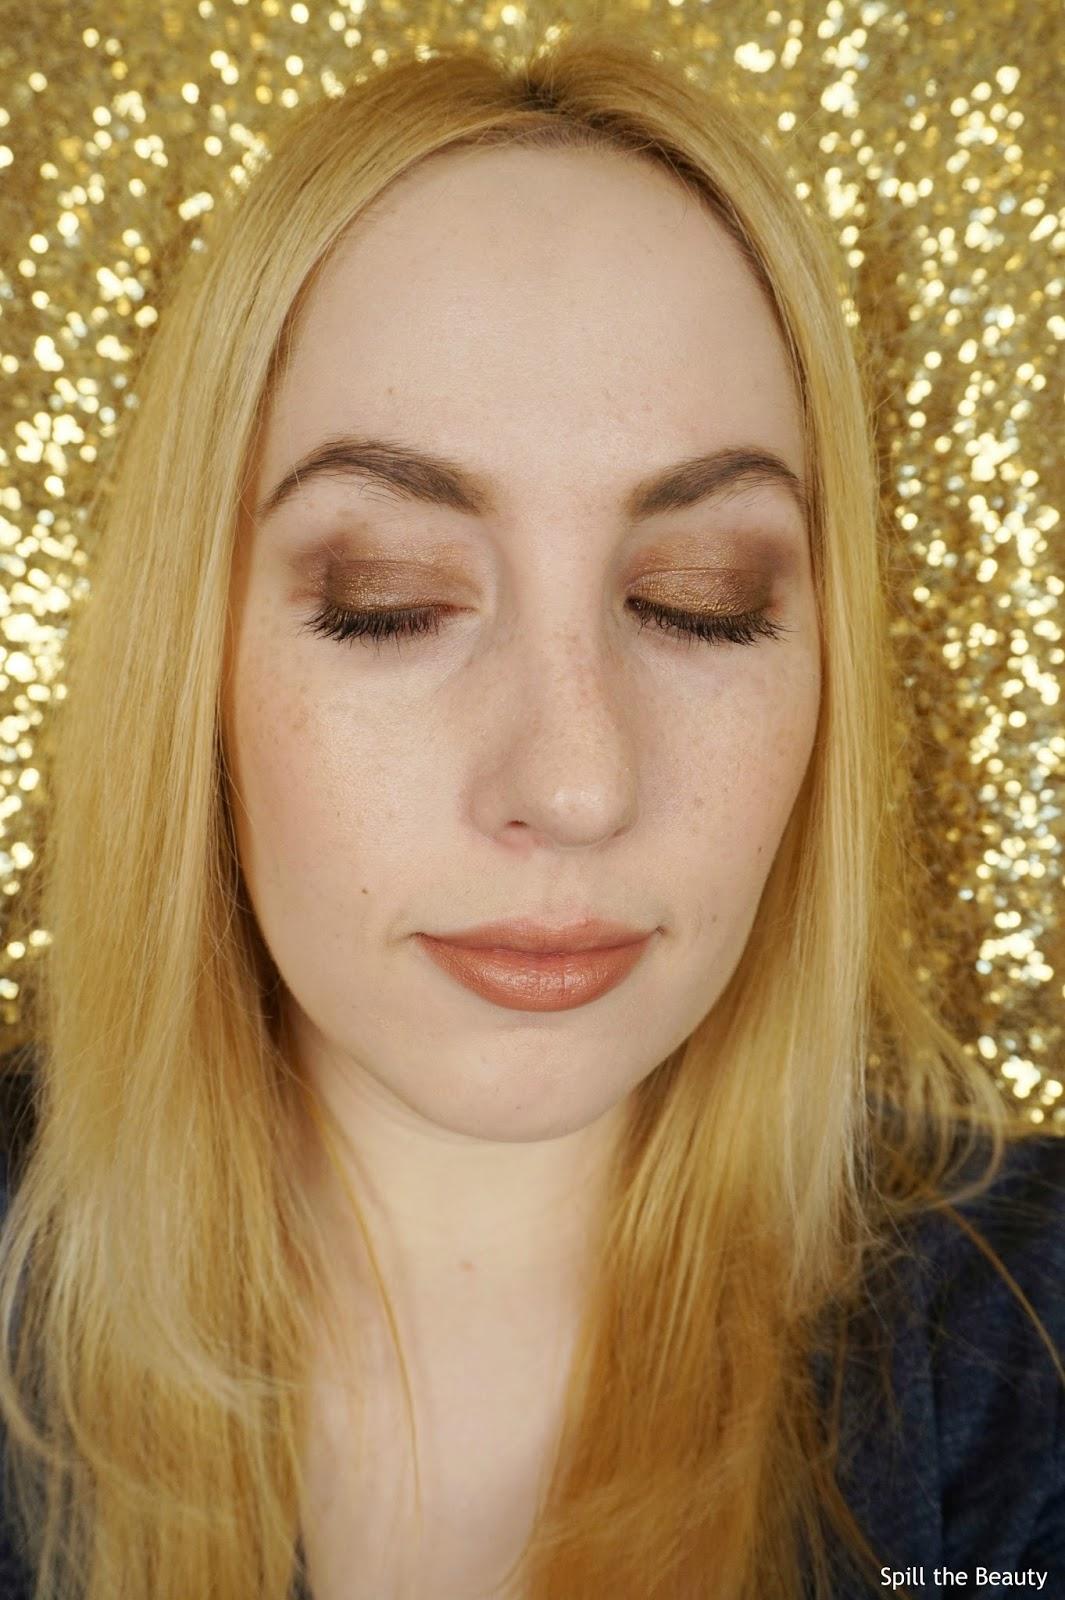 Charlotte Tilbury Quick 'N' Easy The 5 Minute Makeup Revolution